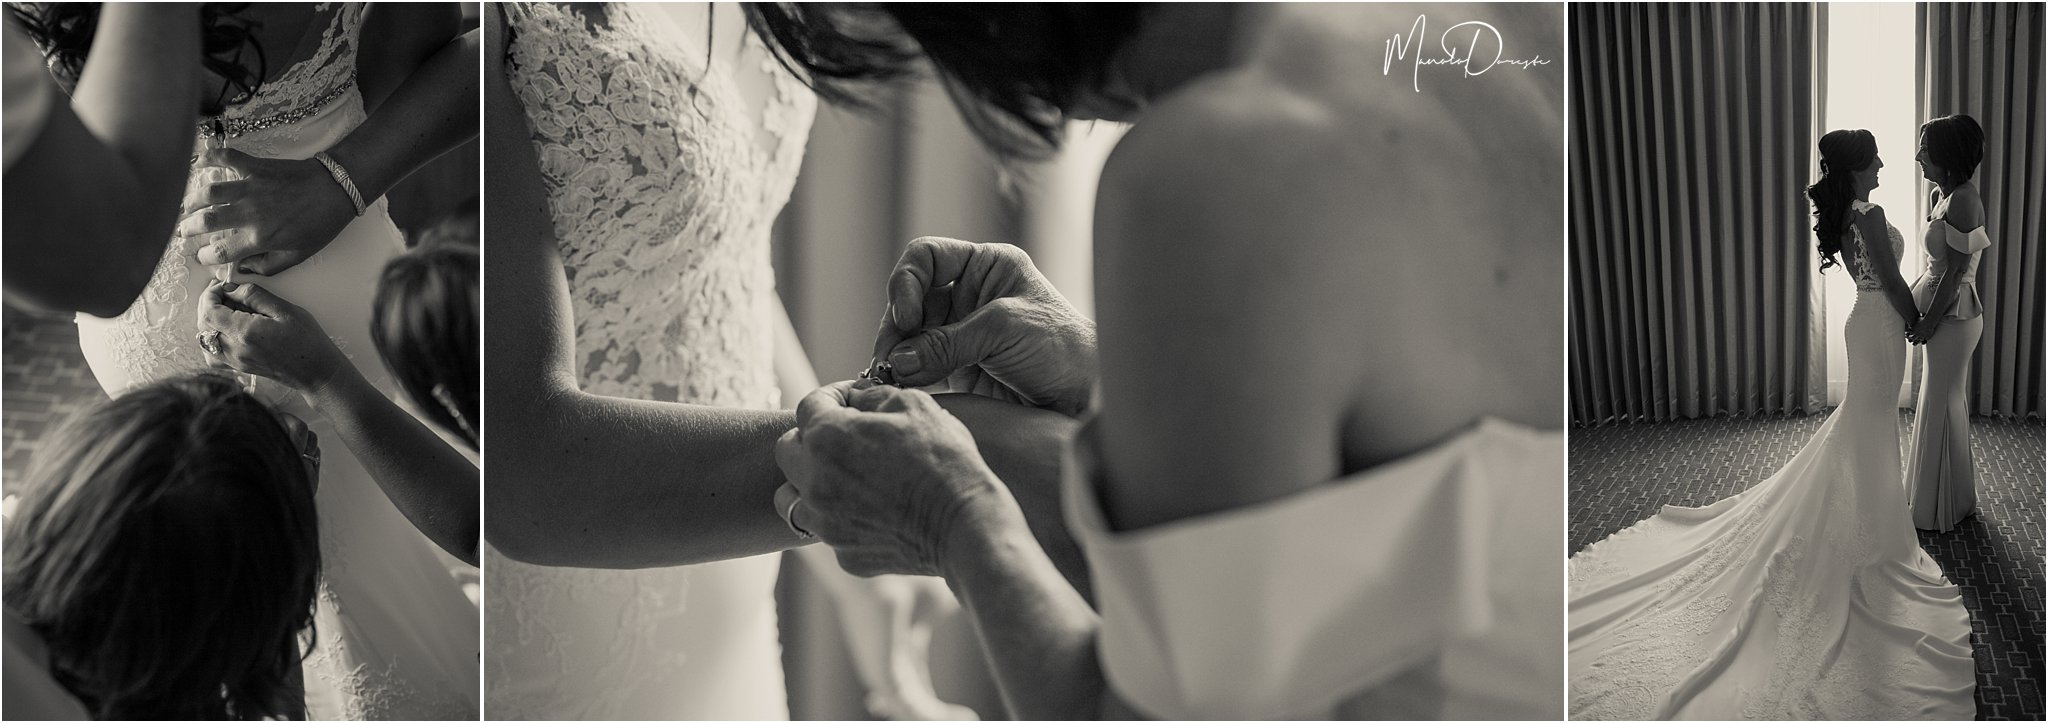 0311_ManoloDoreste_InFocusStudios_Wedding_Family_Photography_Miami_MiamiPhotographer.jpg